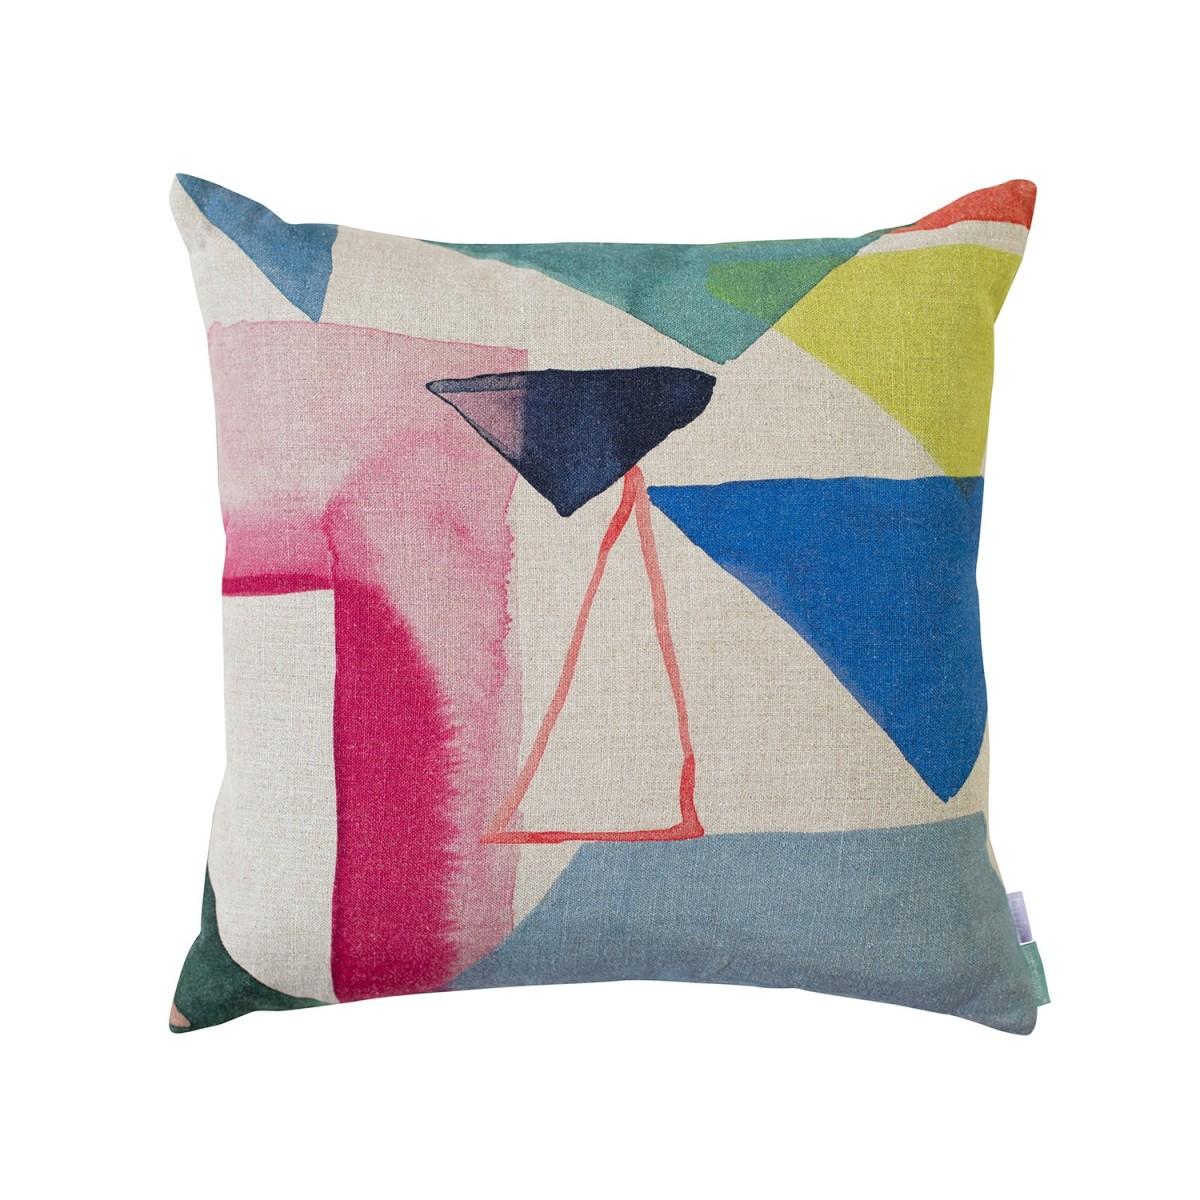 Cushion : Bluebell Gray